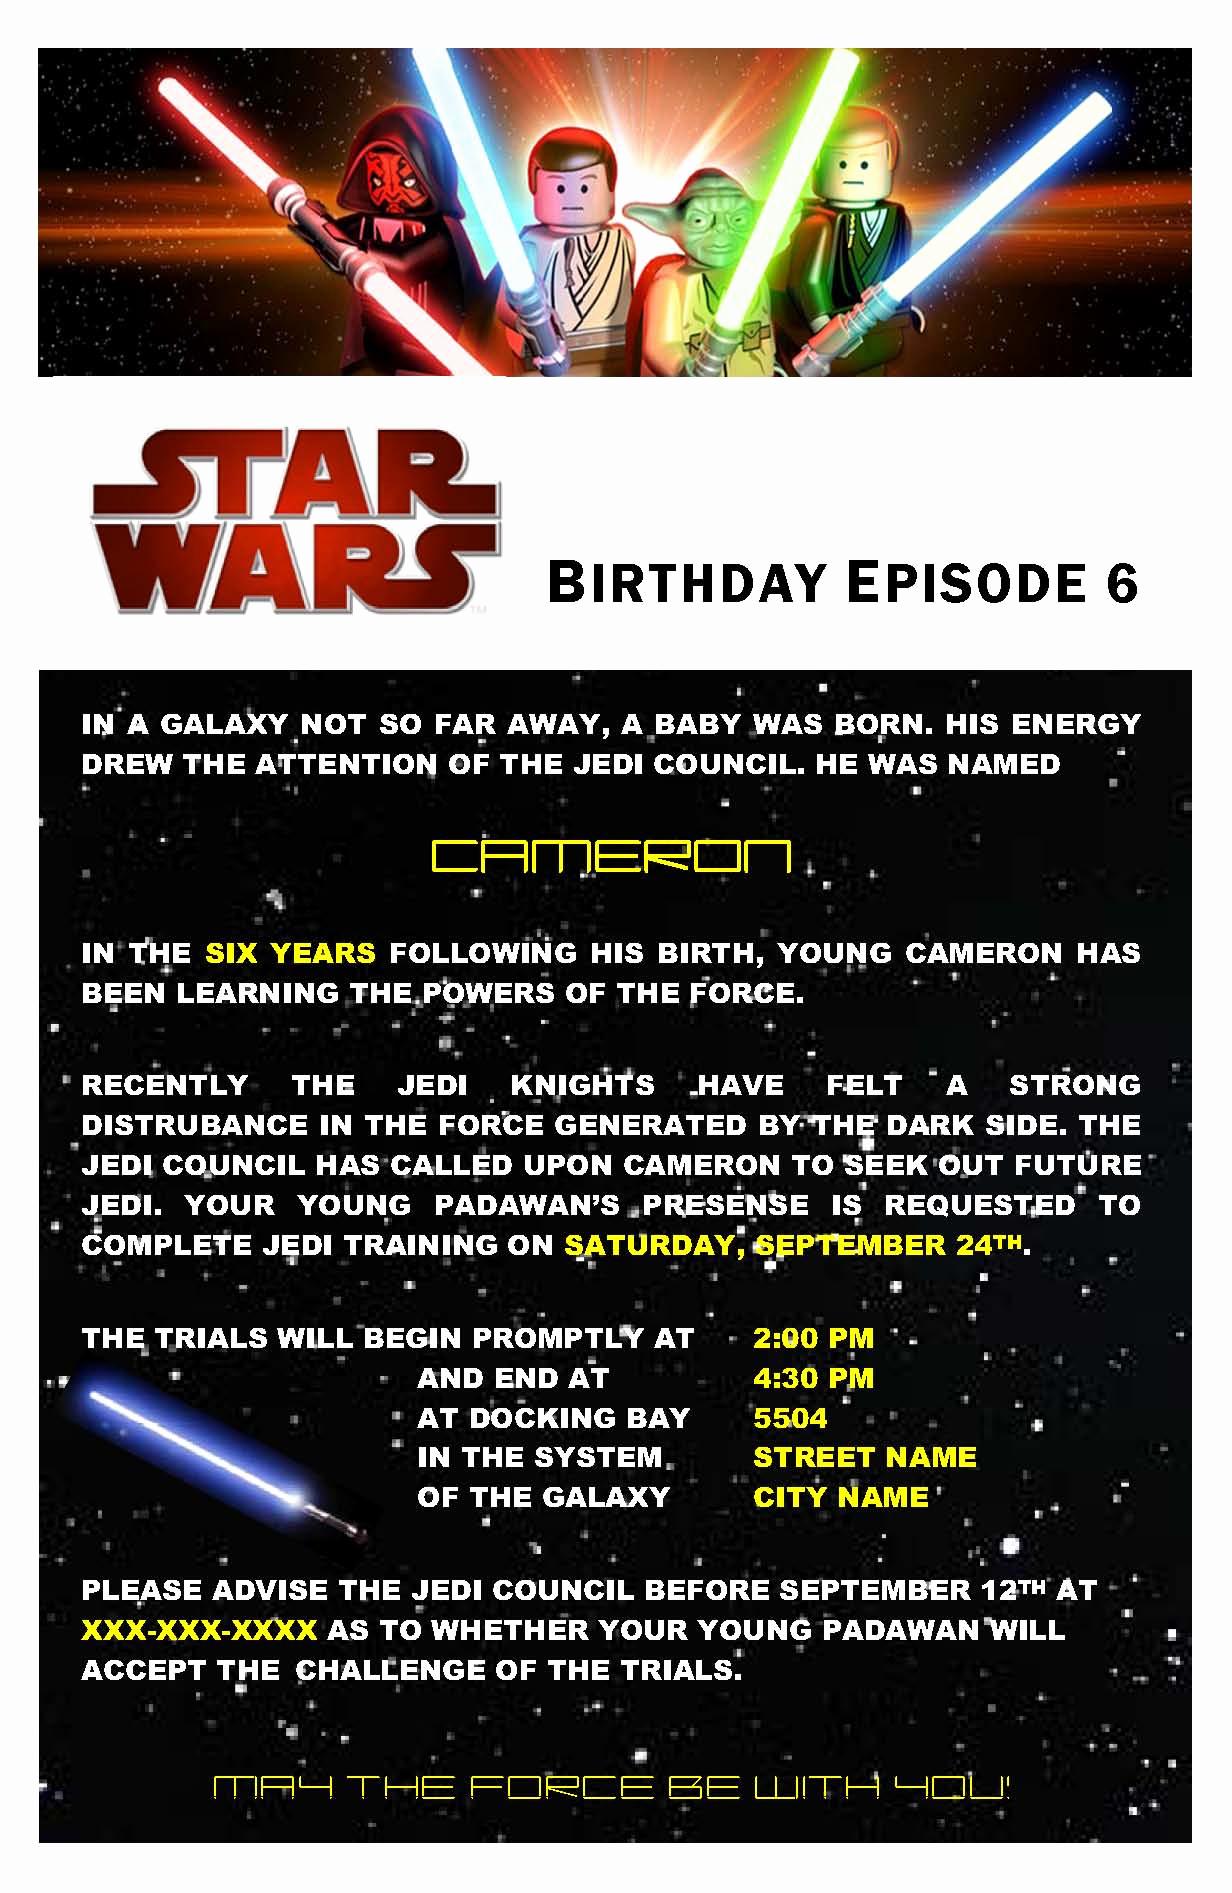 Star Wars Birthday Invitations Inspirational Star Wars Birthday Party